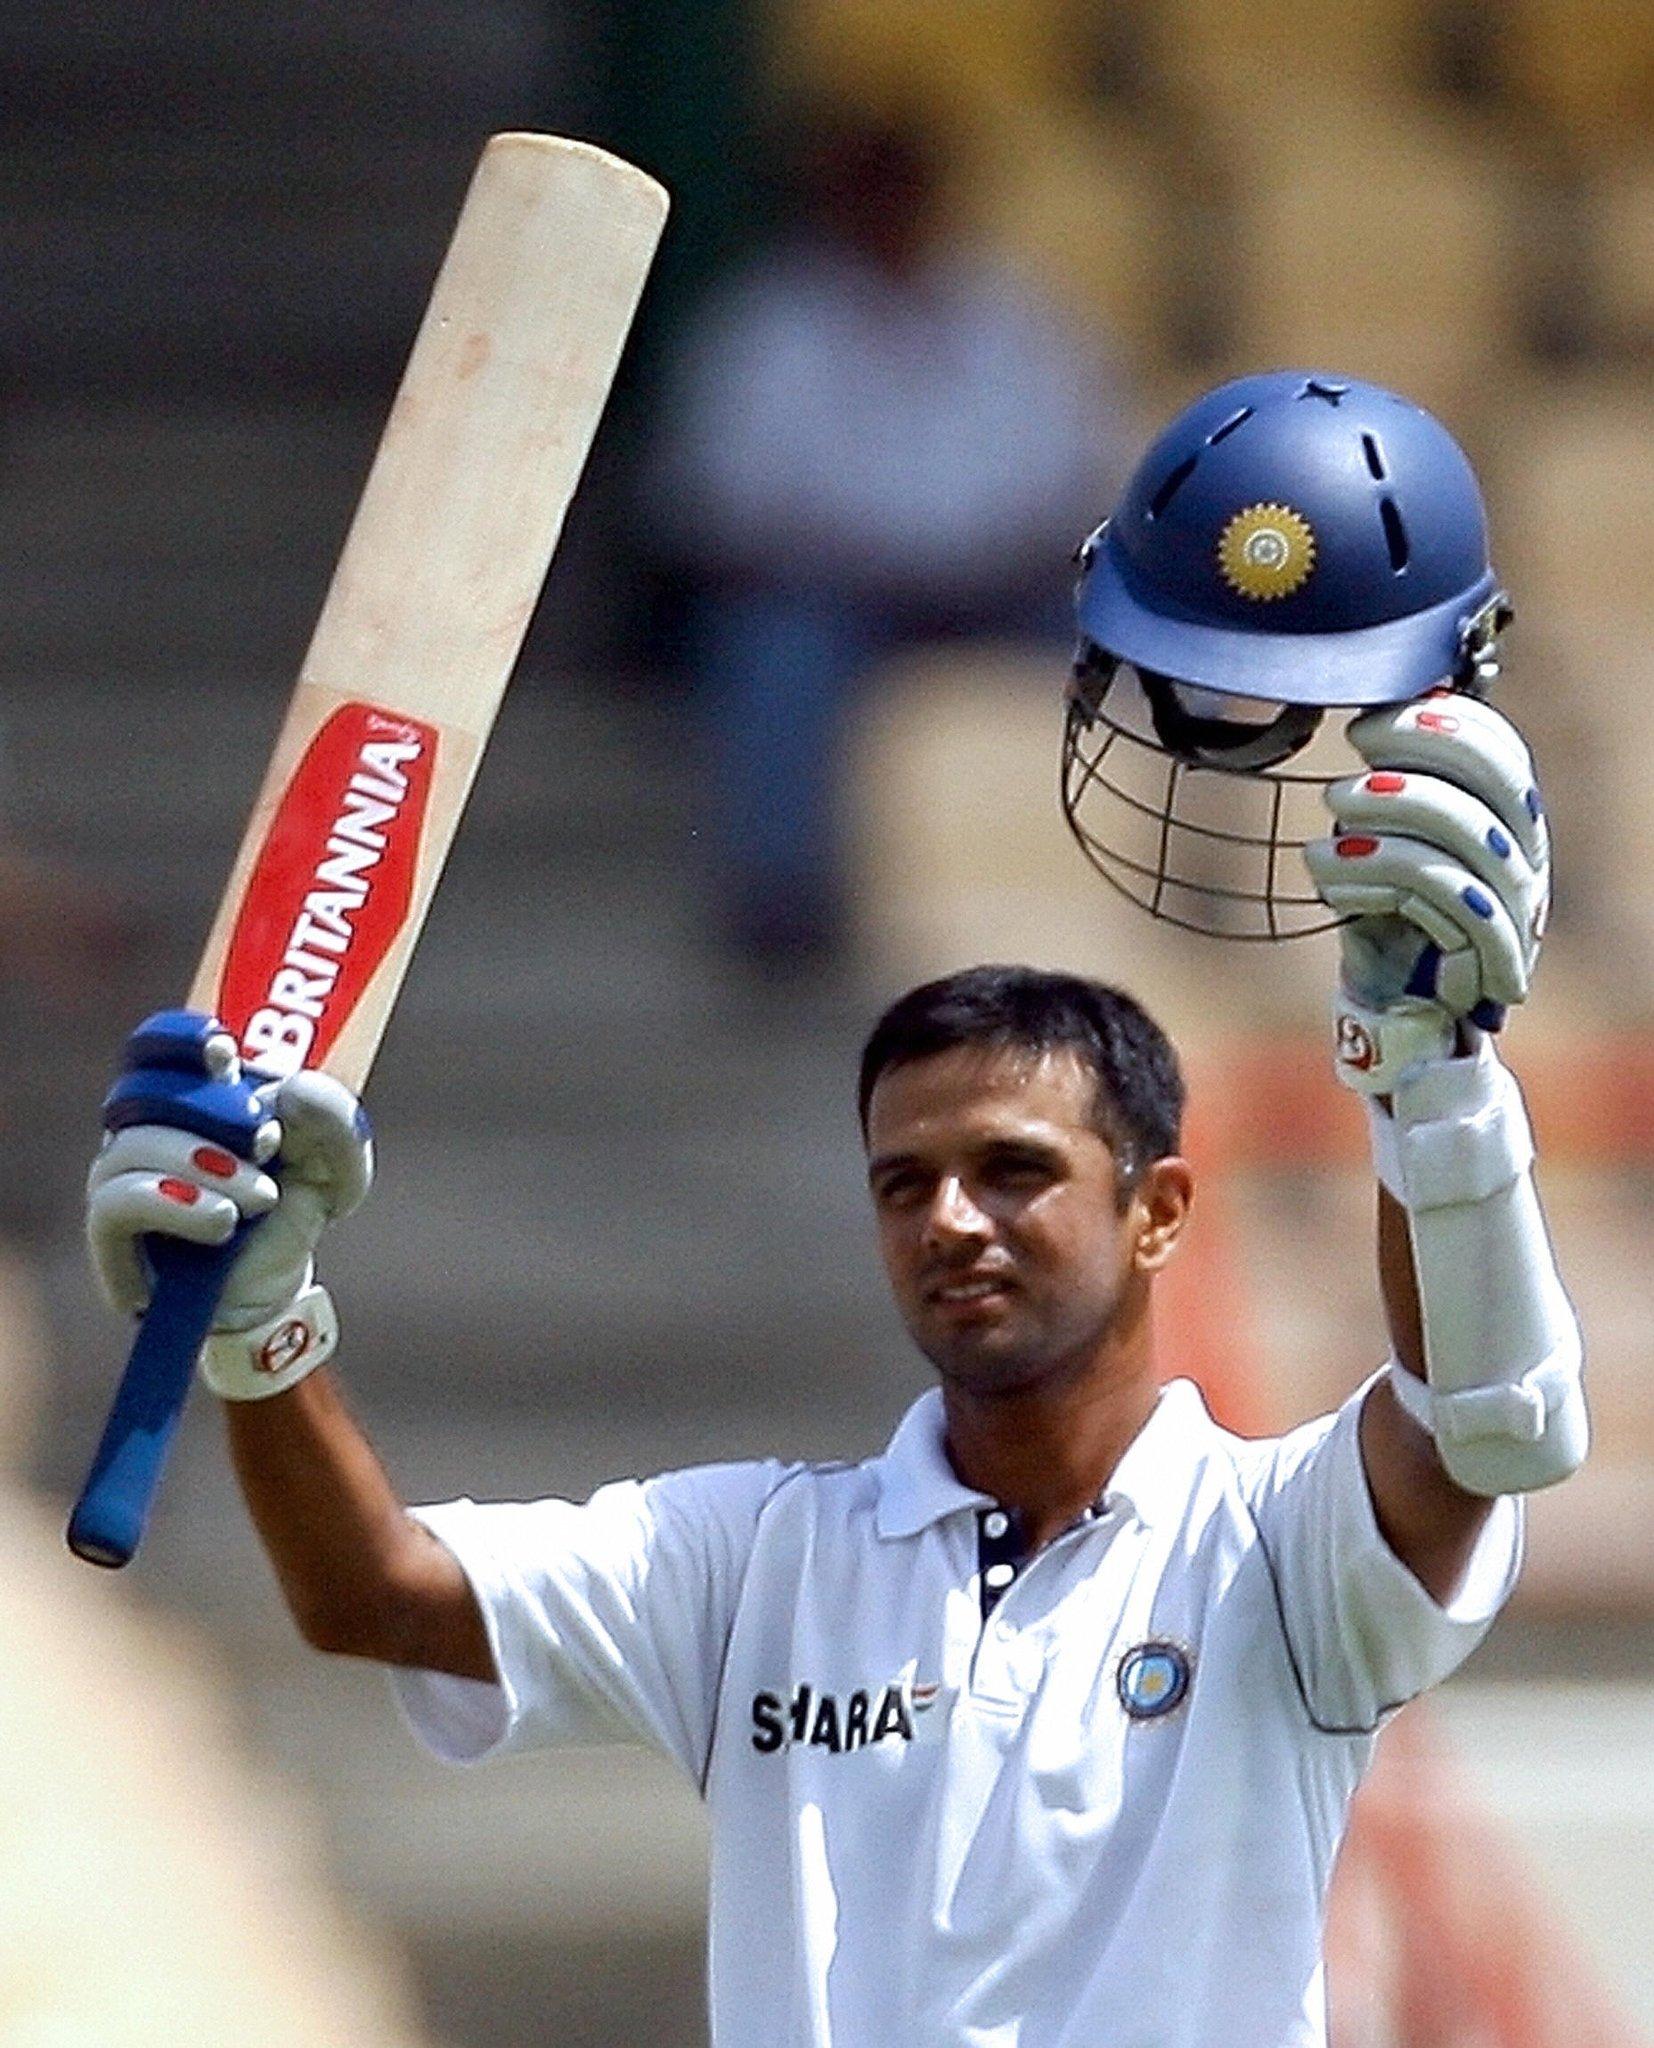 13,288 Test runs 10,889 ODI runs 48 international centuries 1 legendary career  Happy Birthday Rahul Dravid!